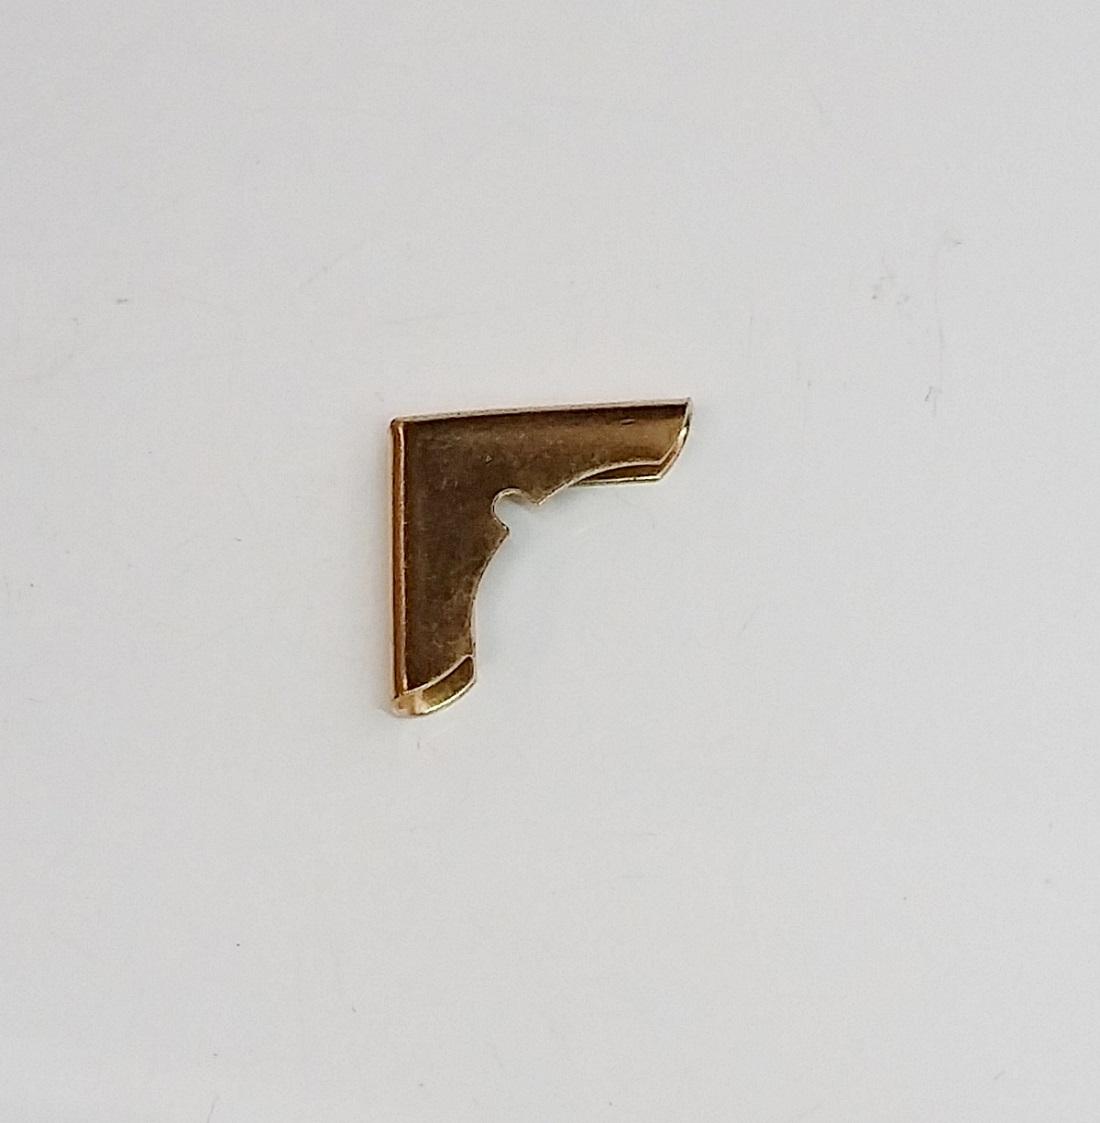 Cantoneira 18mm x 18mm Latonada